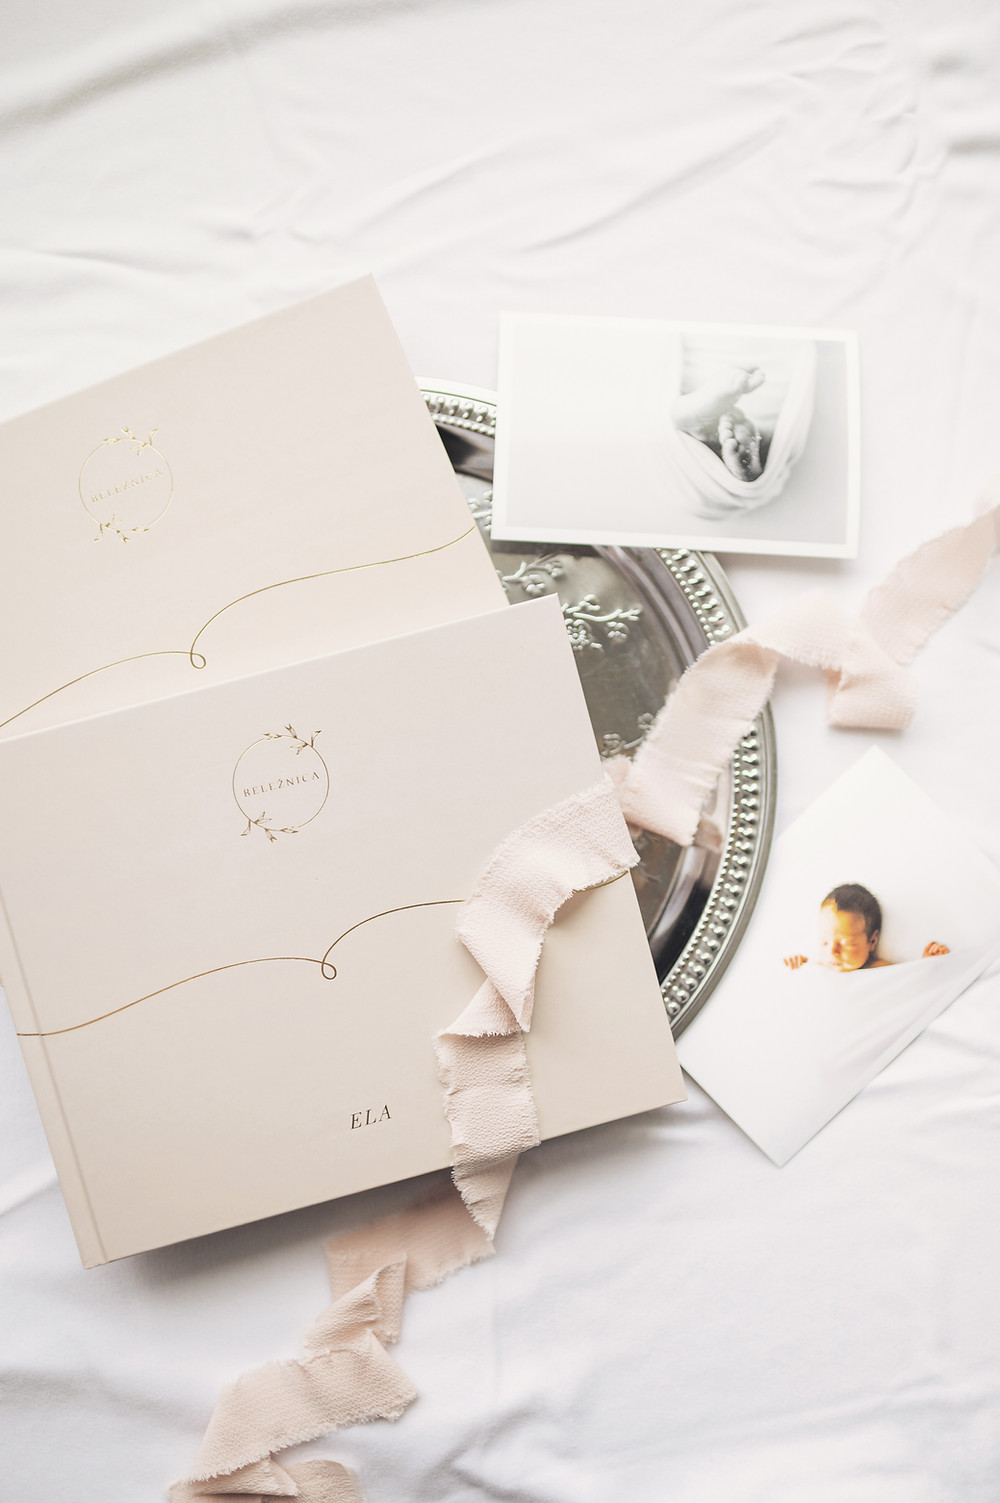 Dojenčkov album - Baby beležnica